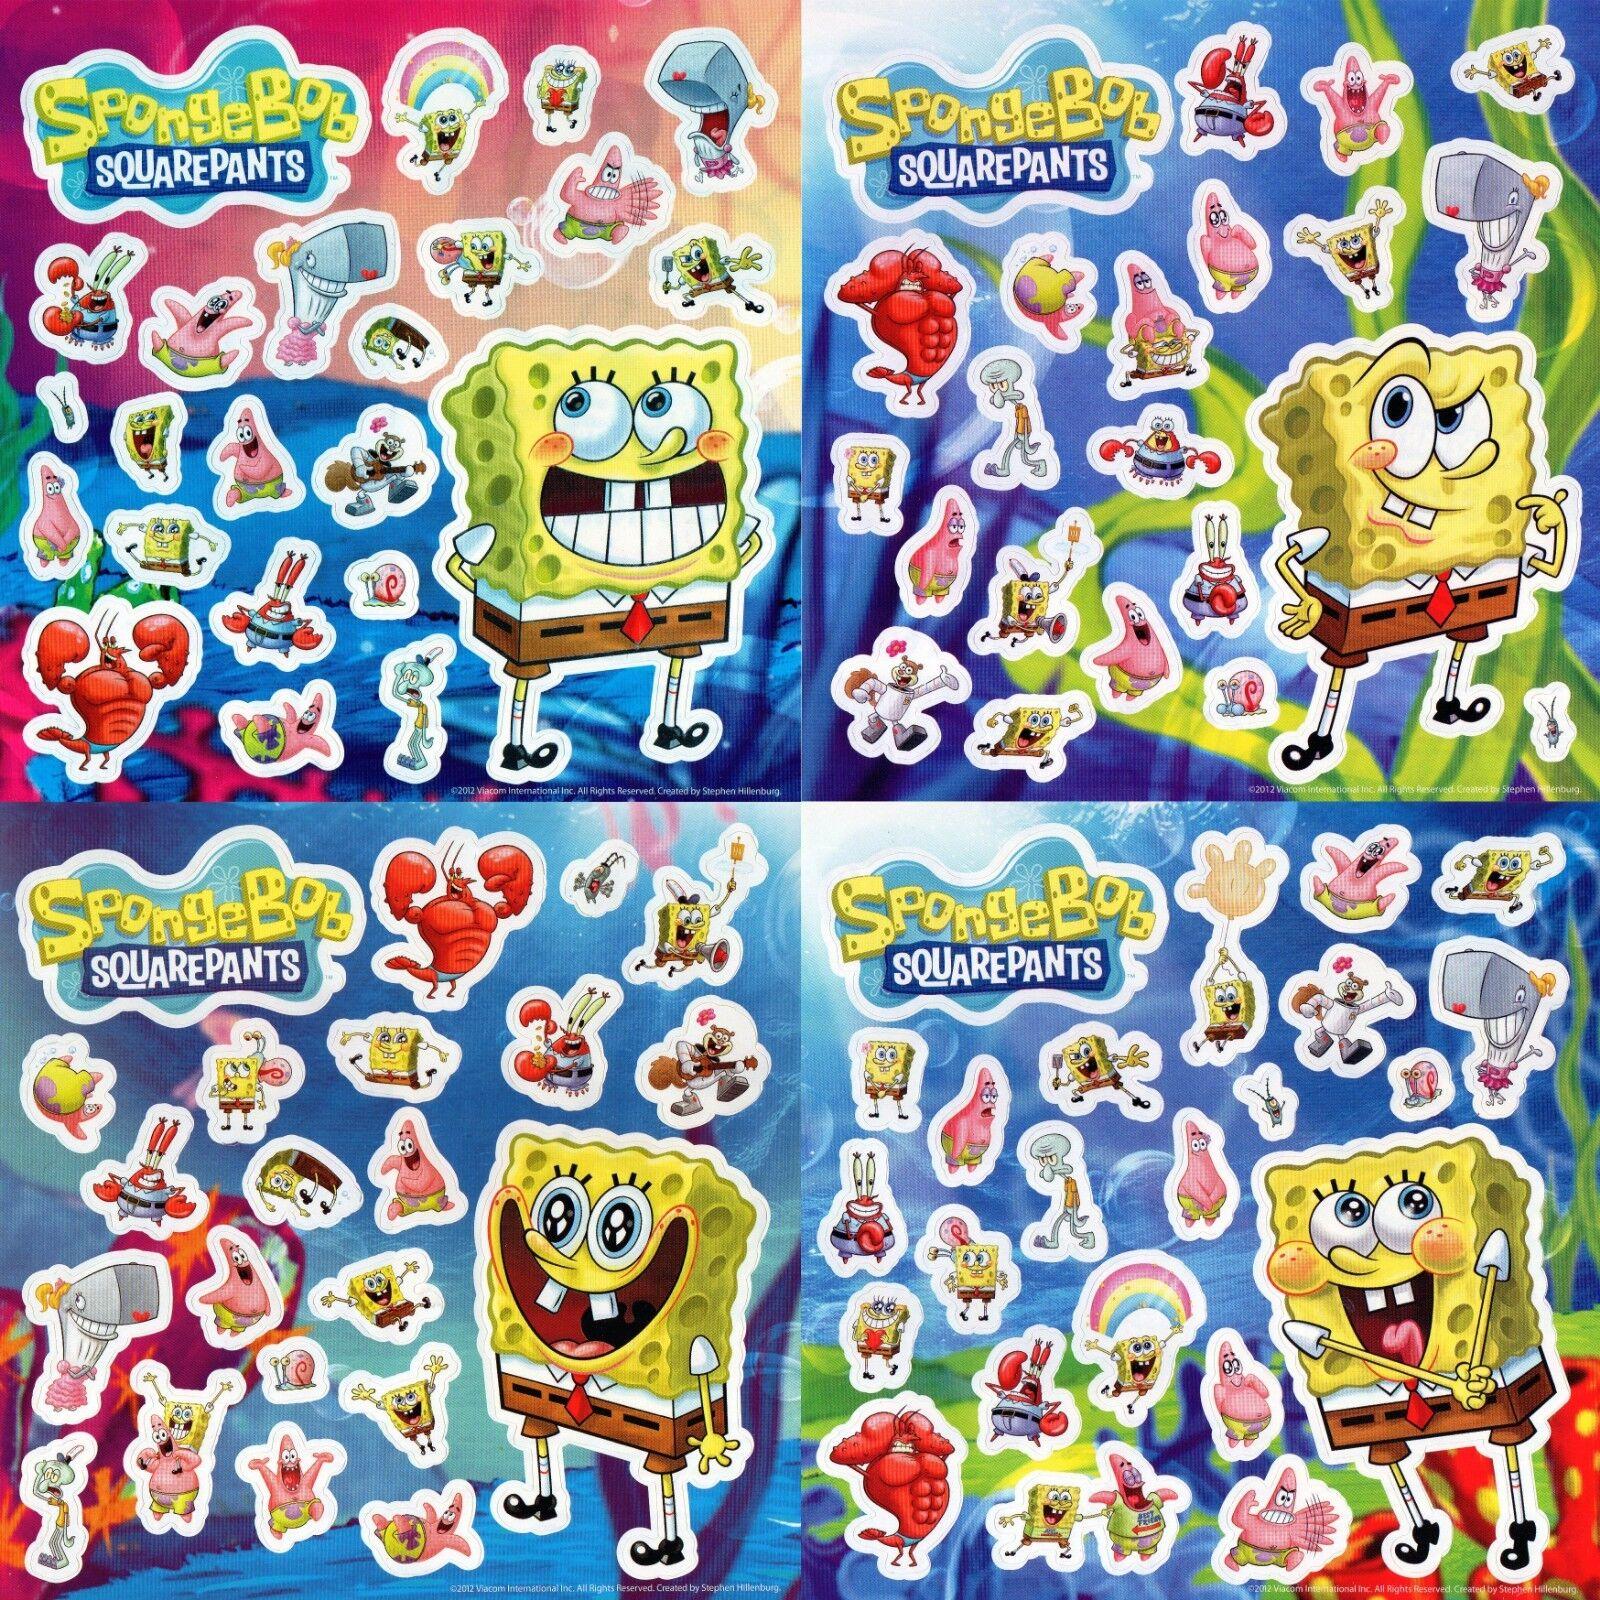 SpongeBob SquarePants 48pc Birthday Party Favor Goodie Fillers Mix Value Pack